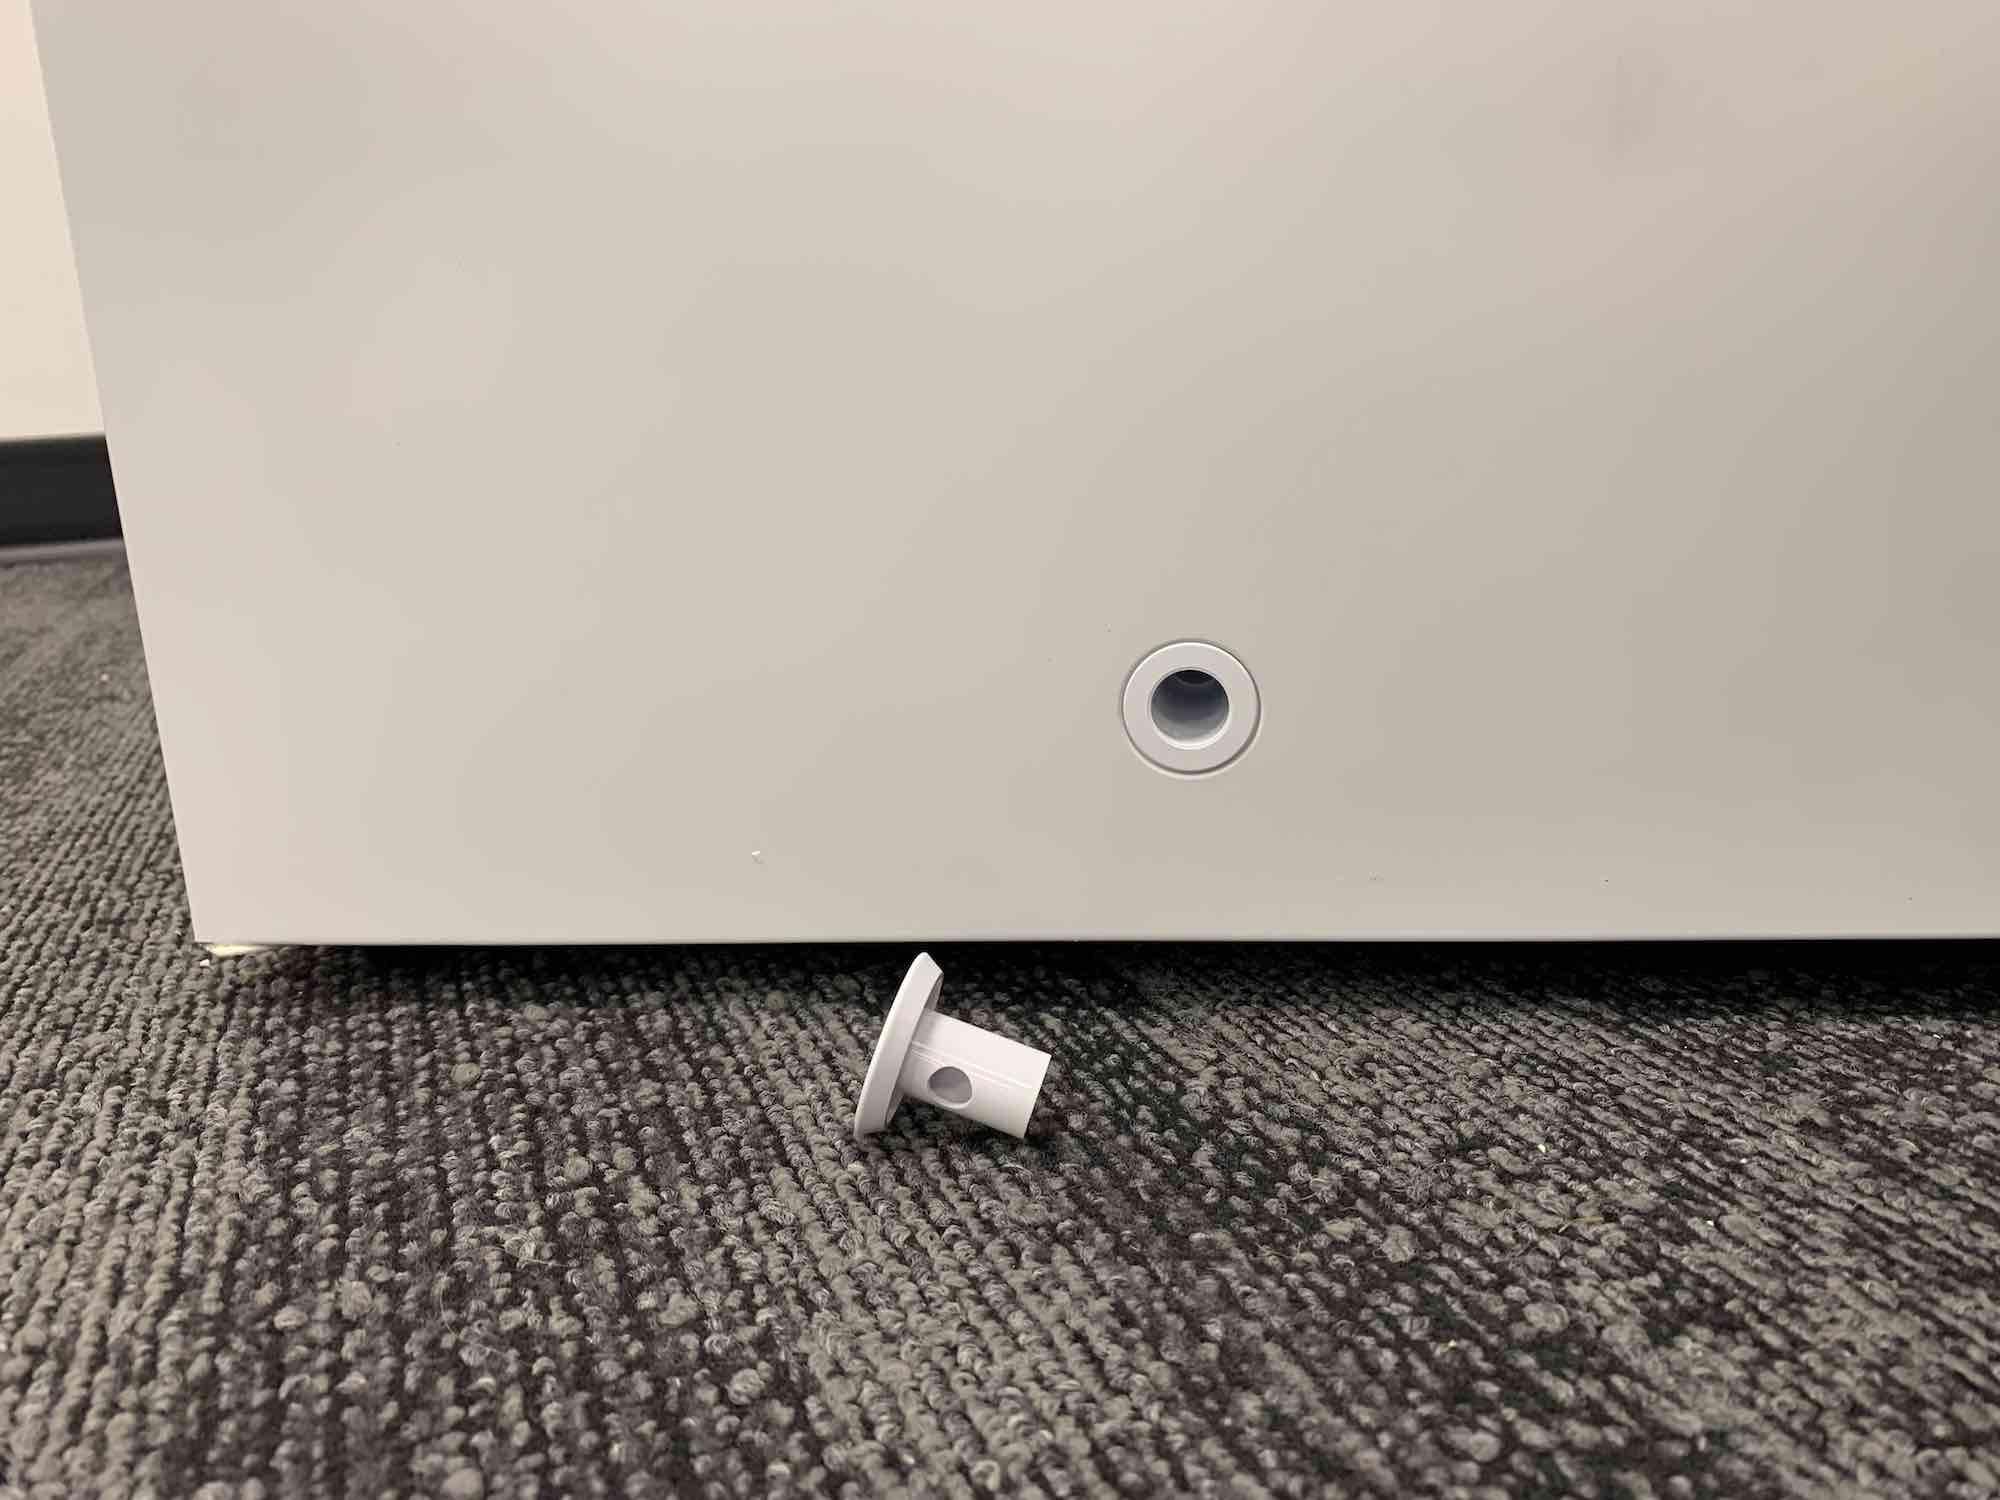 Insignia chest freezer drain plug